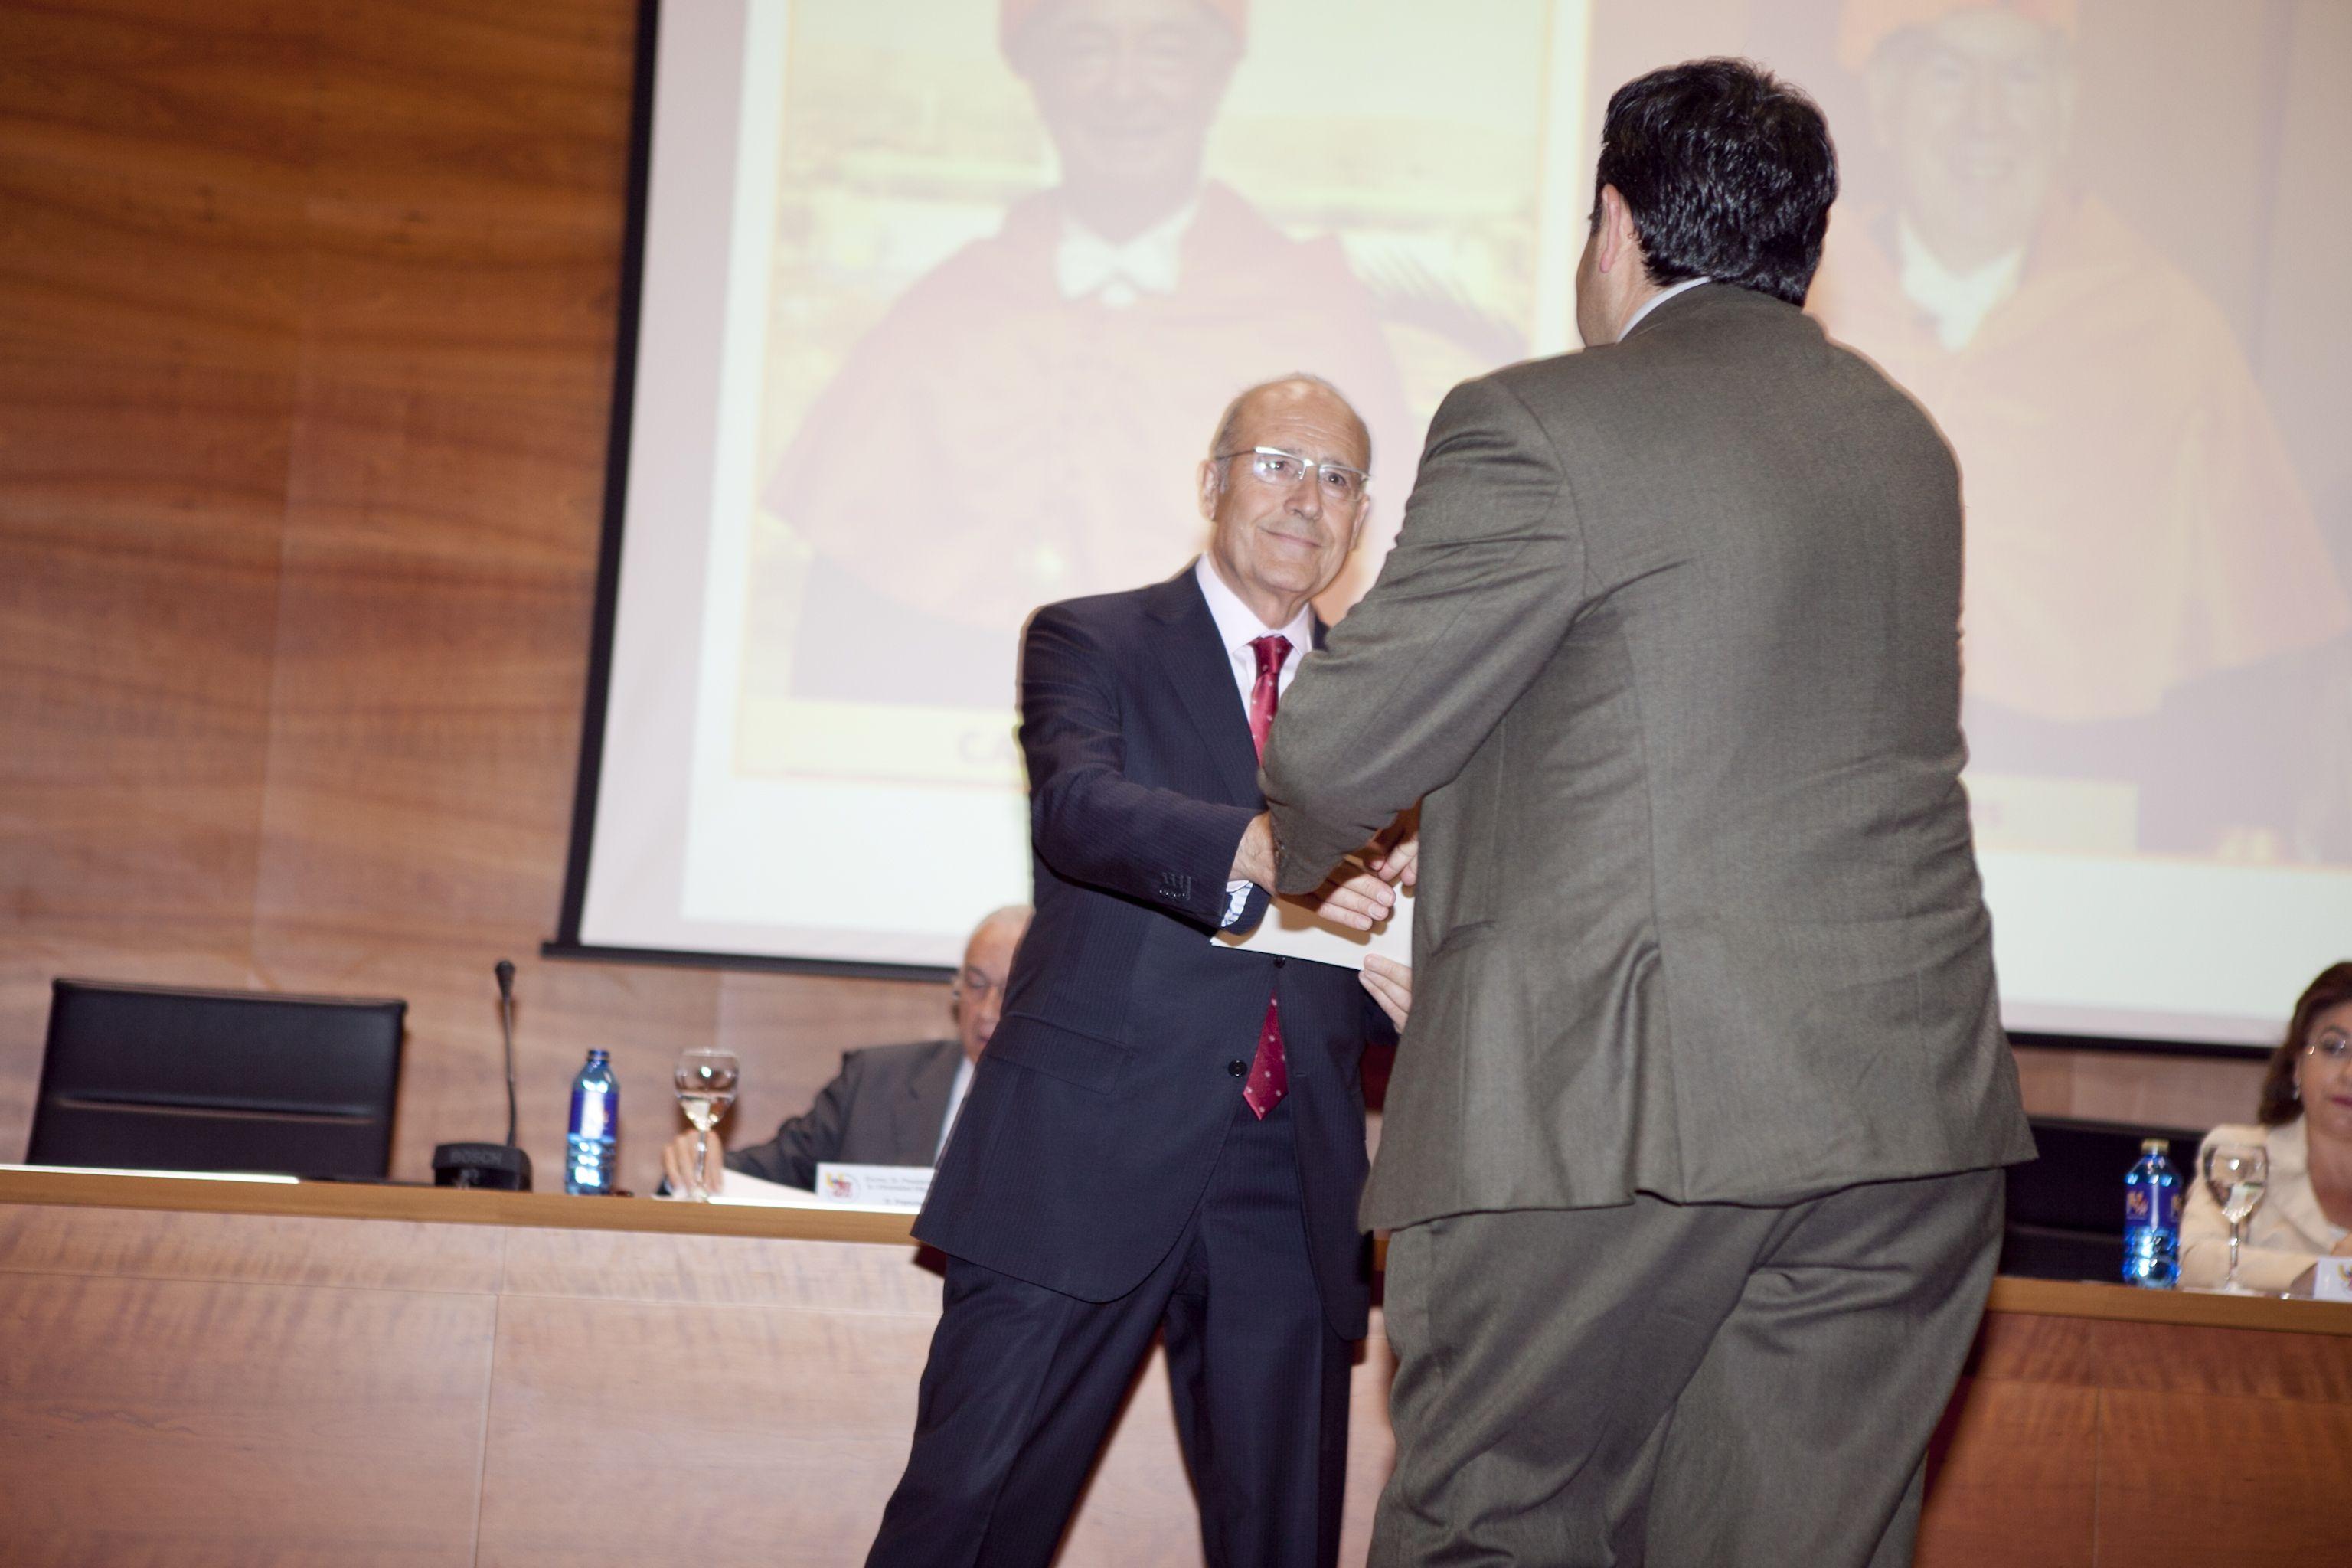 umh-diplomas-rector_mg_6493.jpg